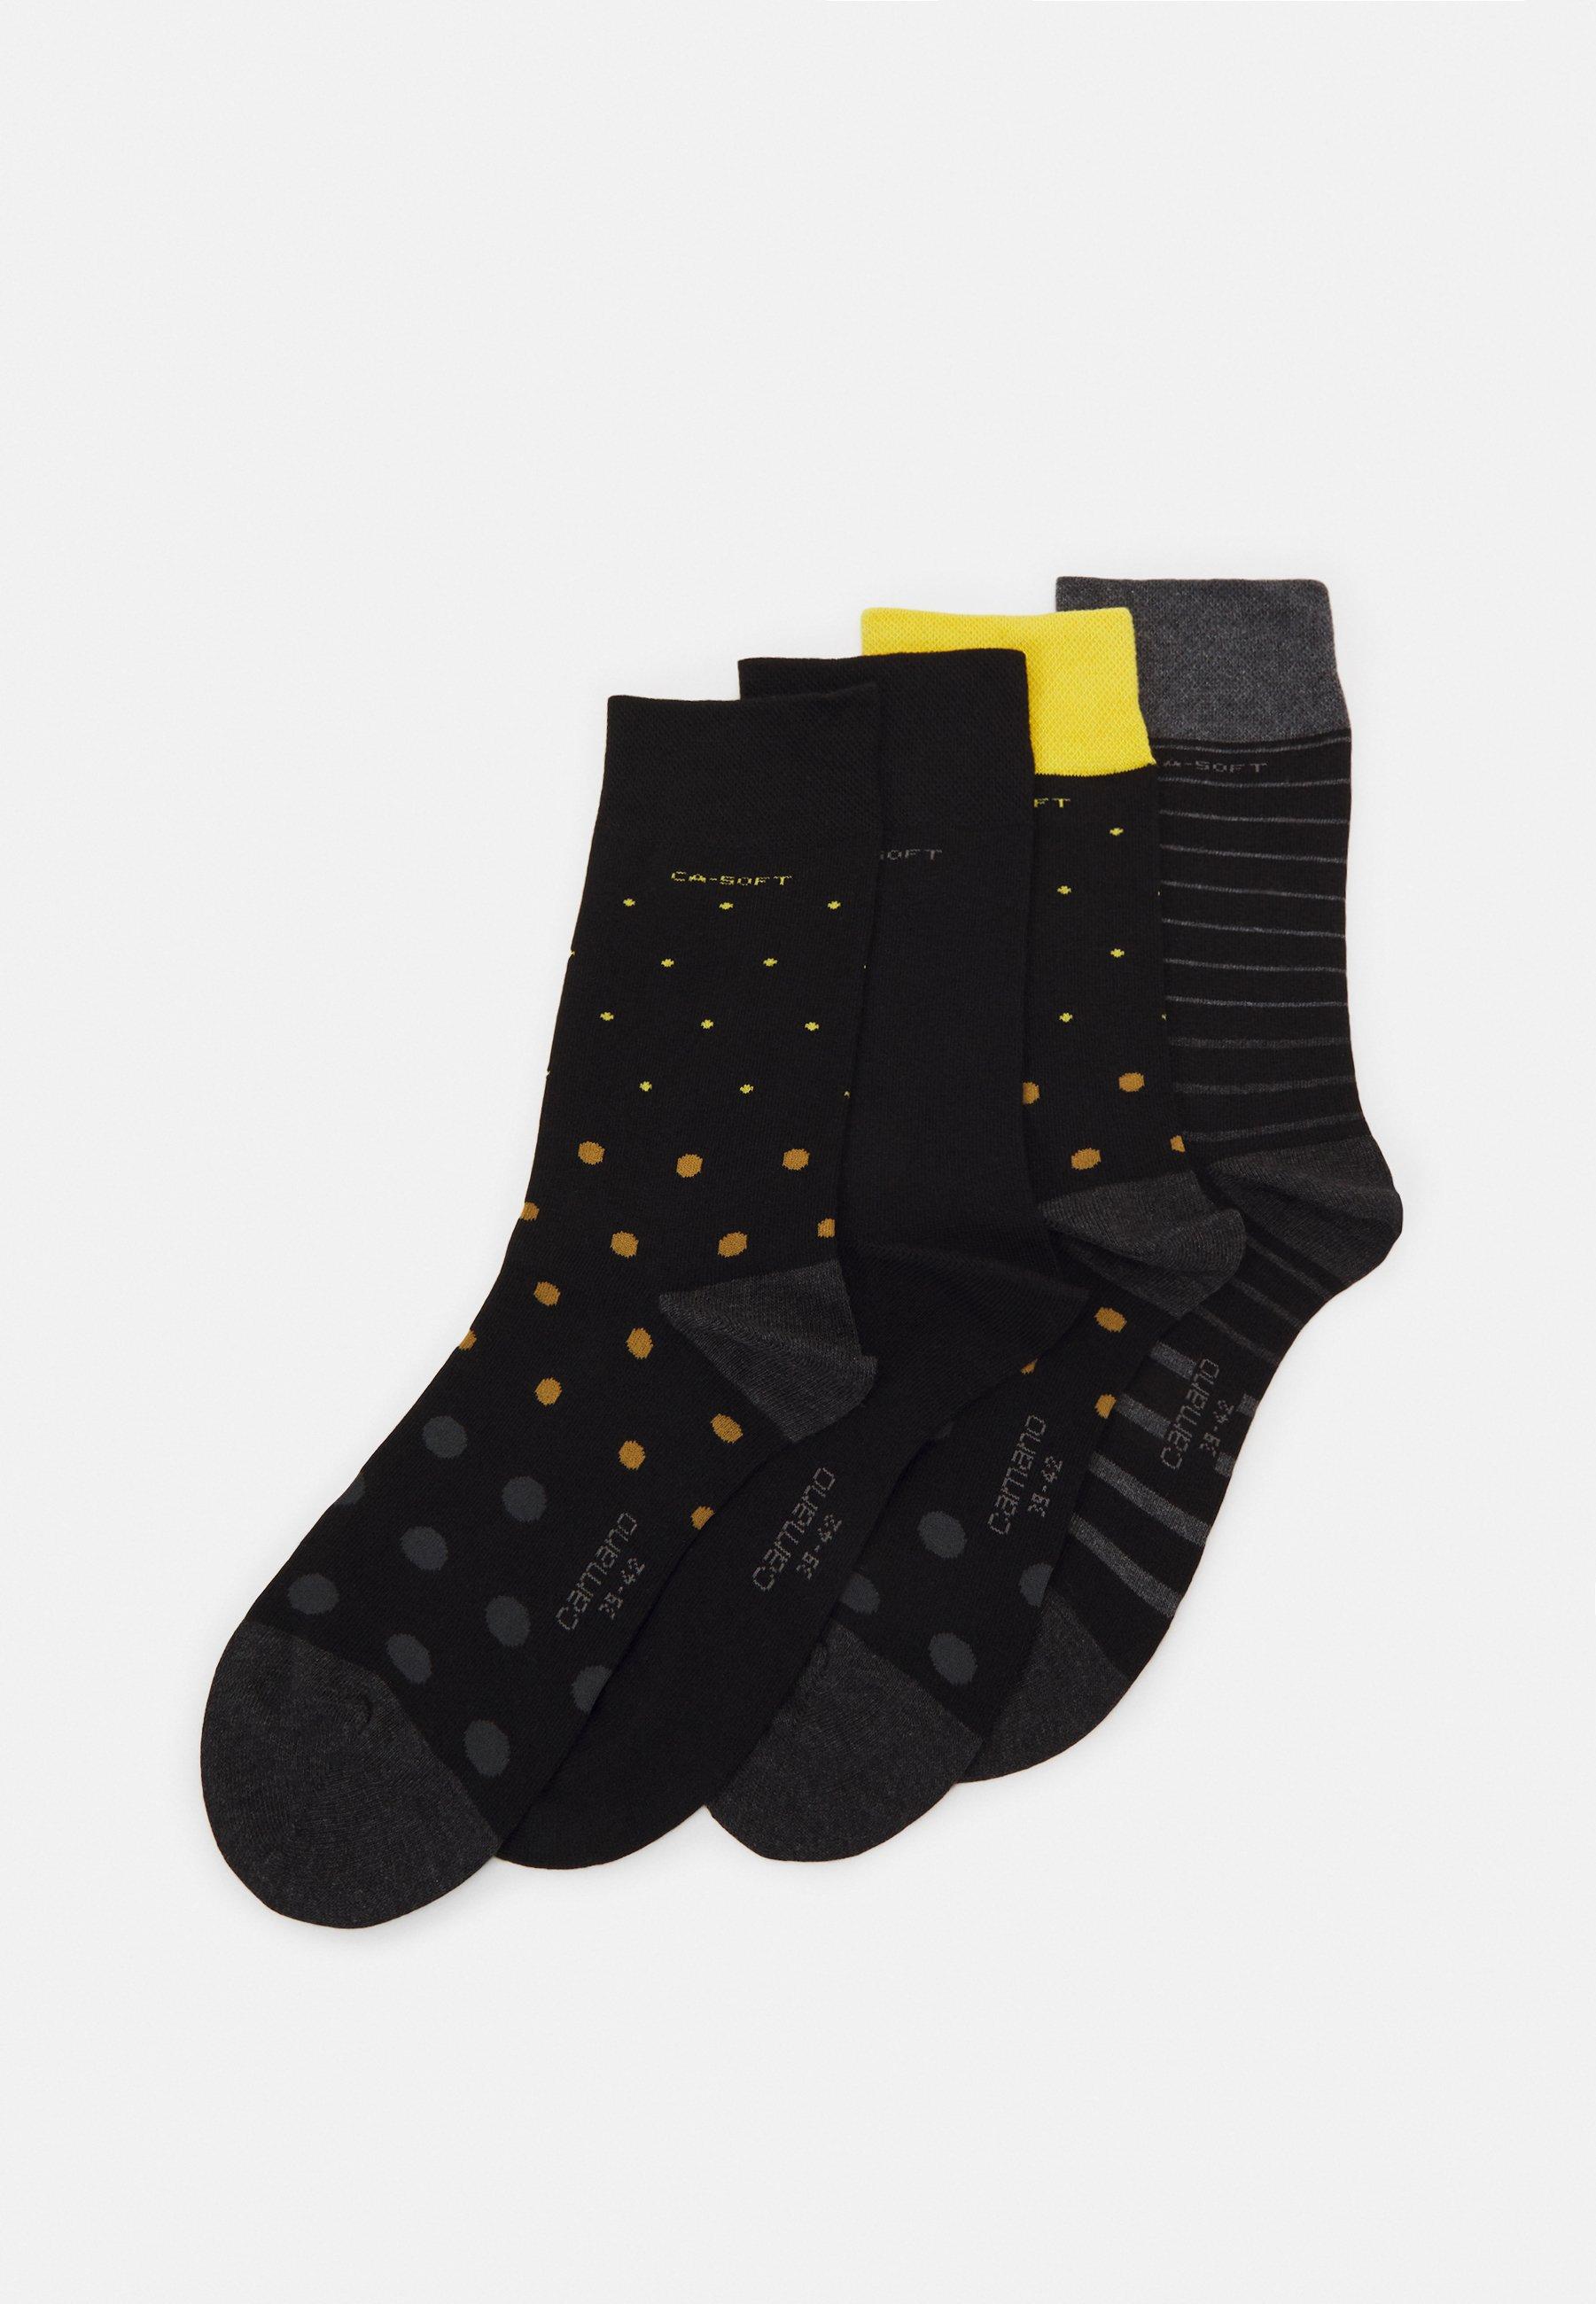 Homme ONLINE SOFT SOCKS UNISEX 4 PACK - Chaussettes